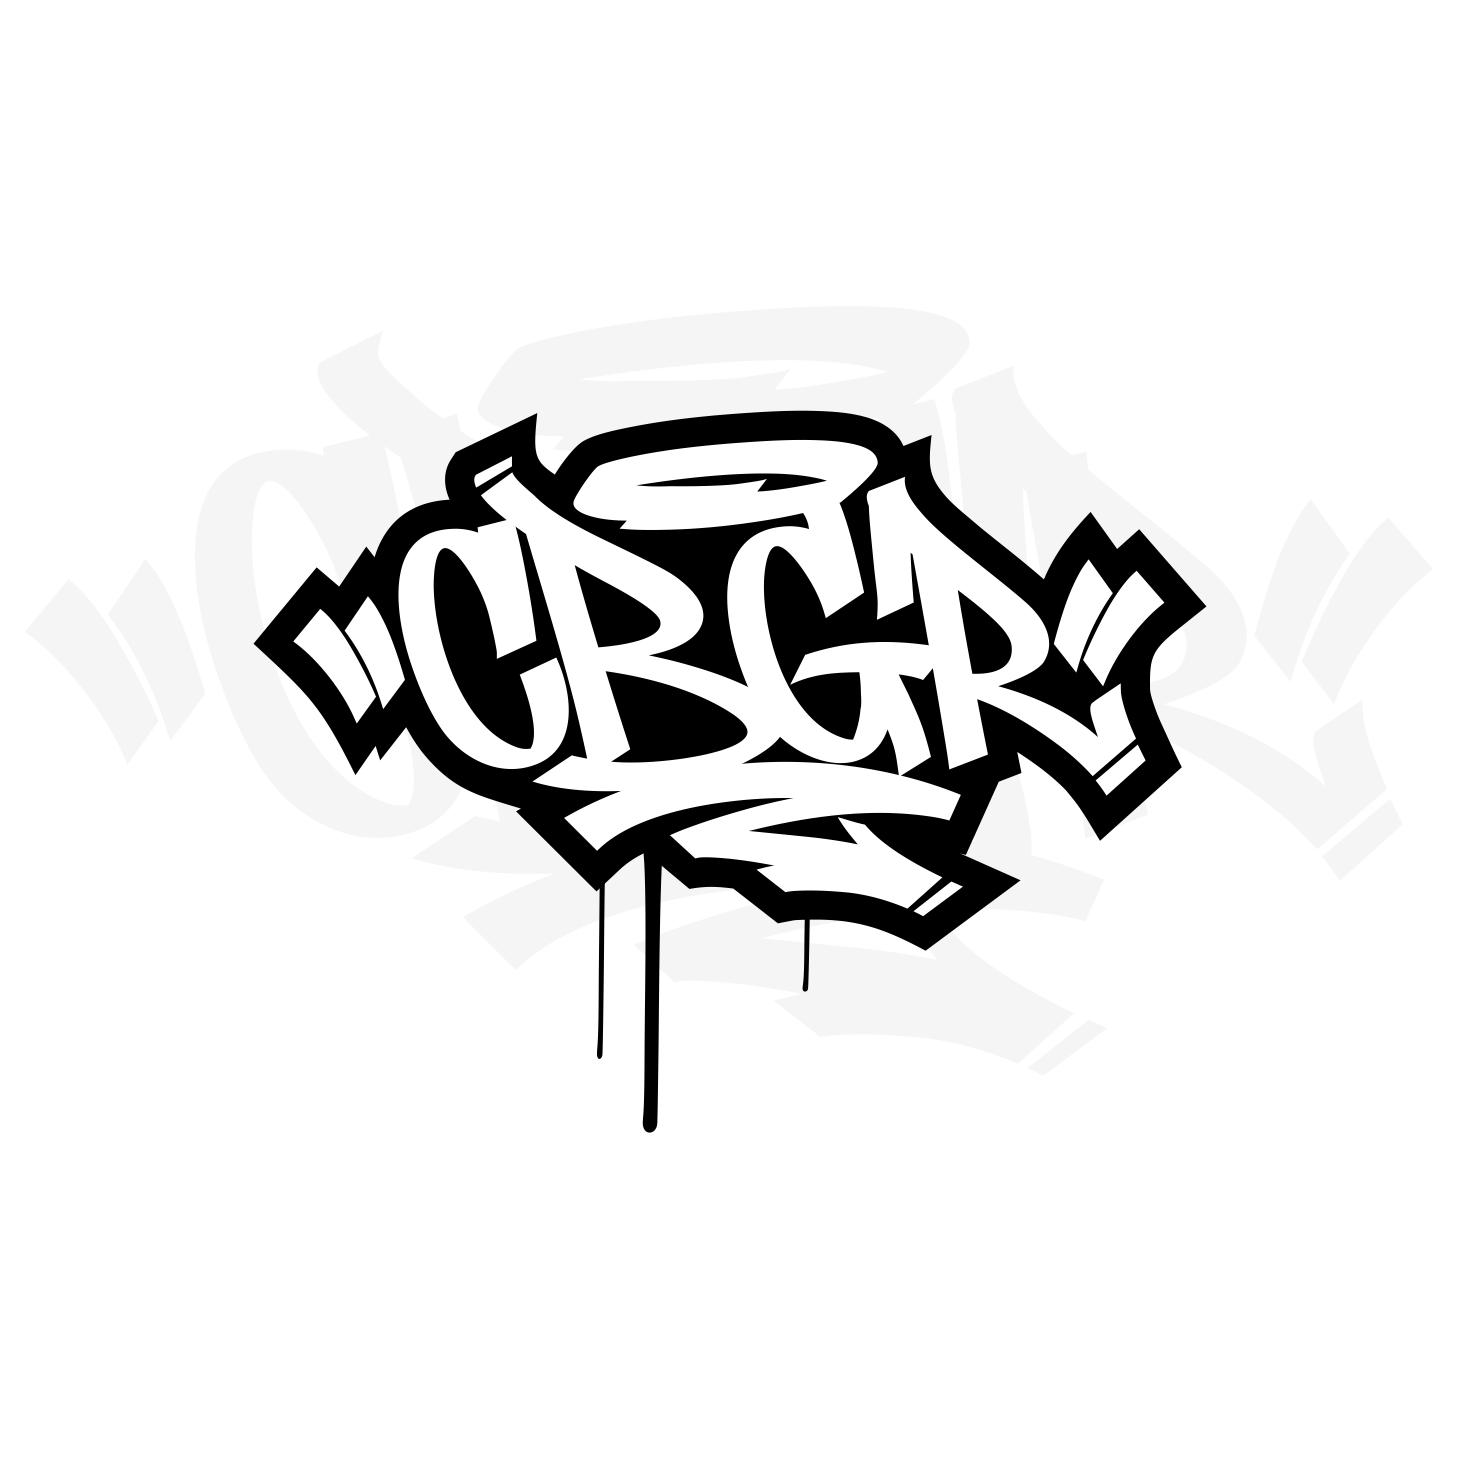 A simple urban photography logo